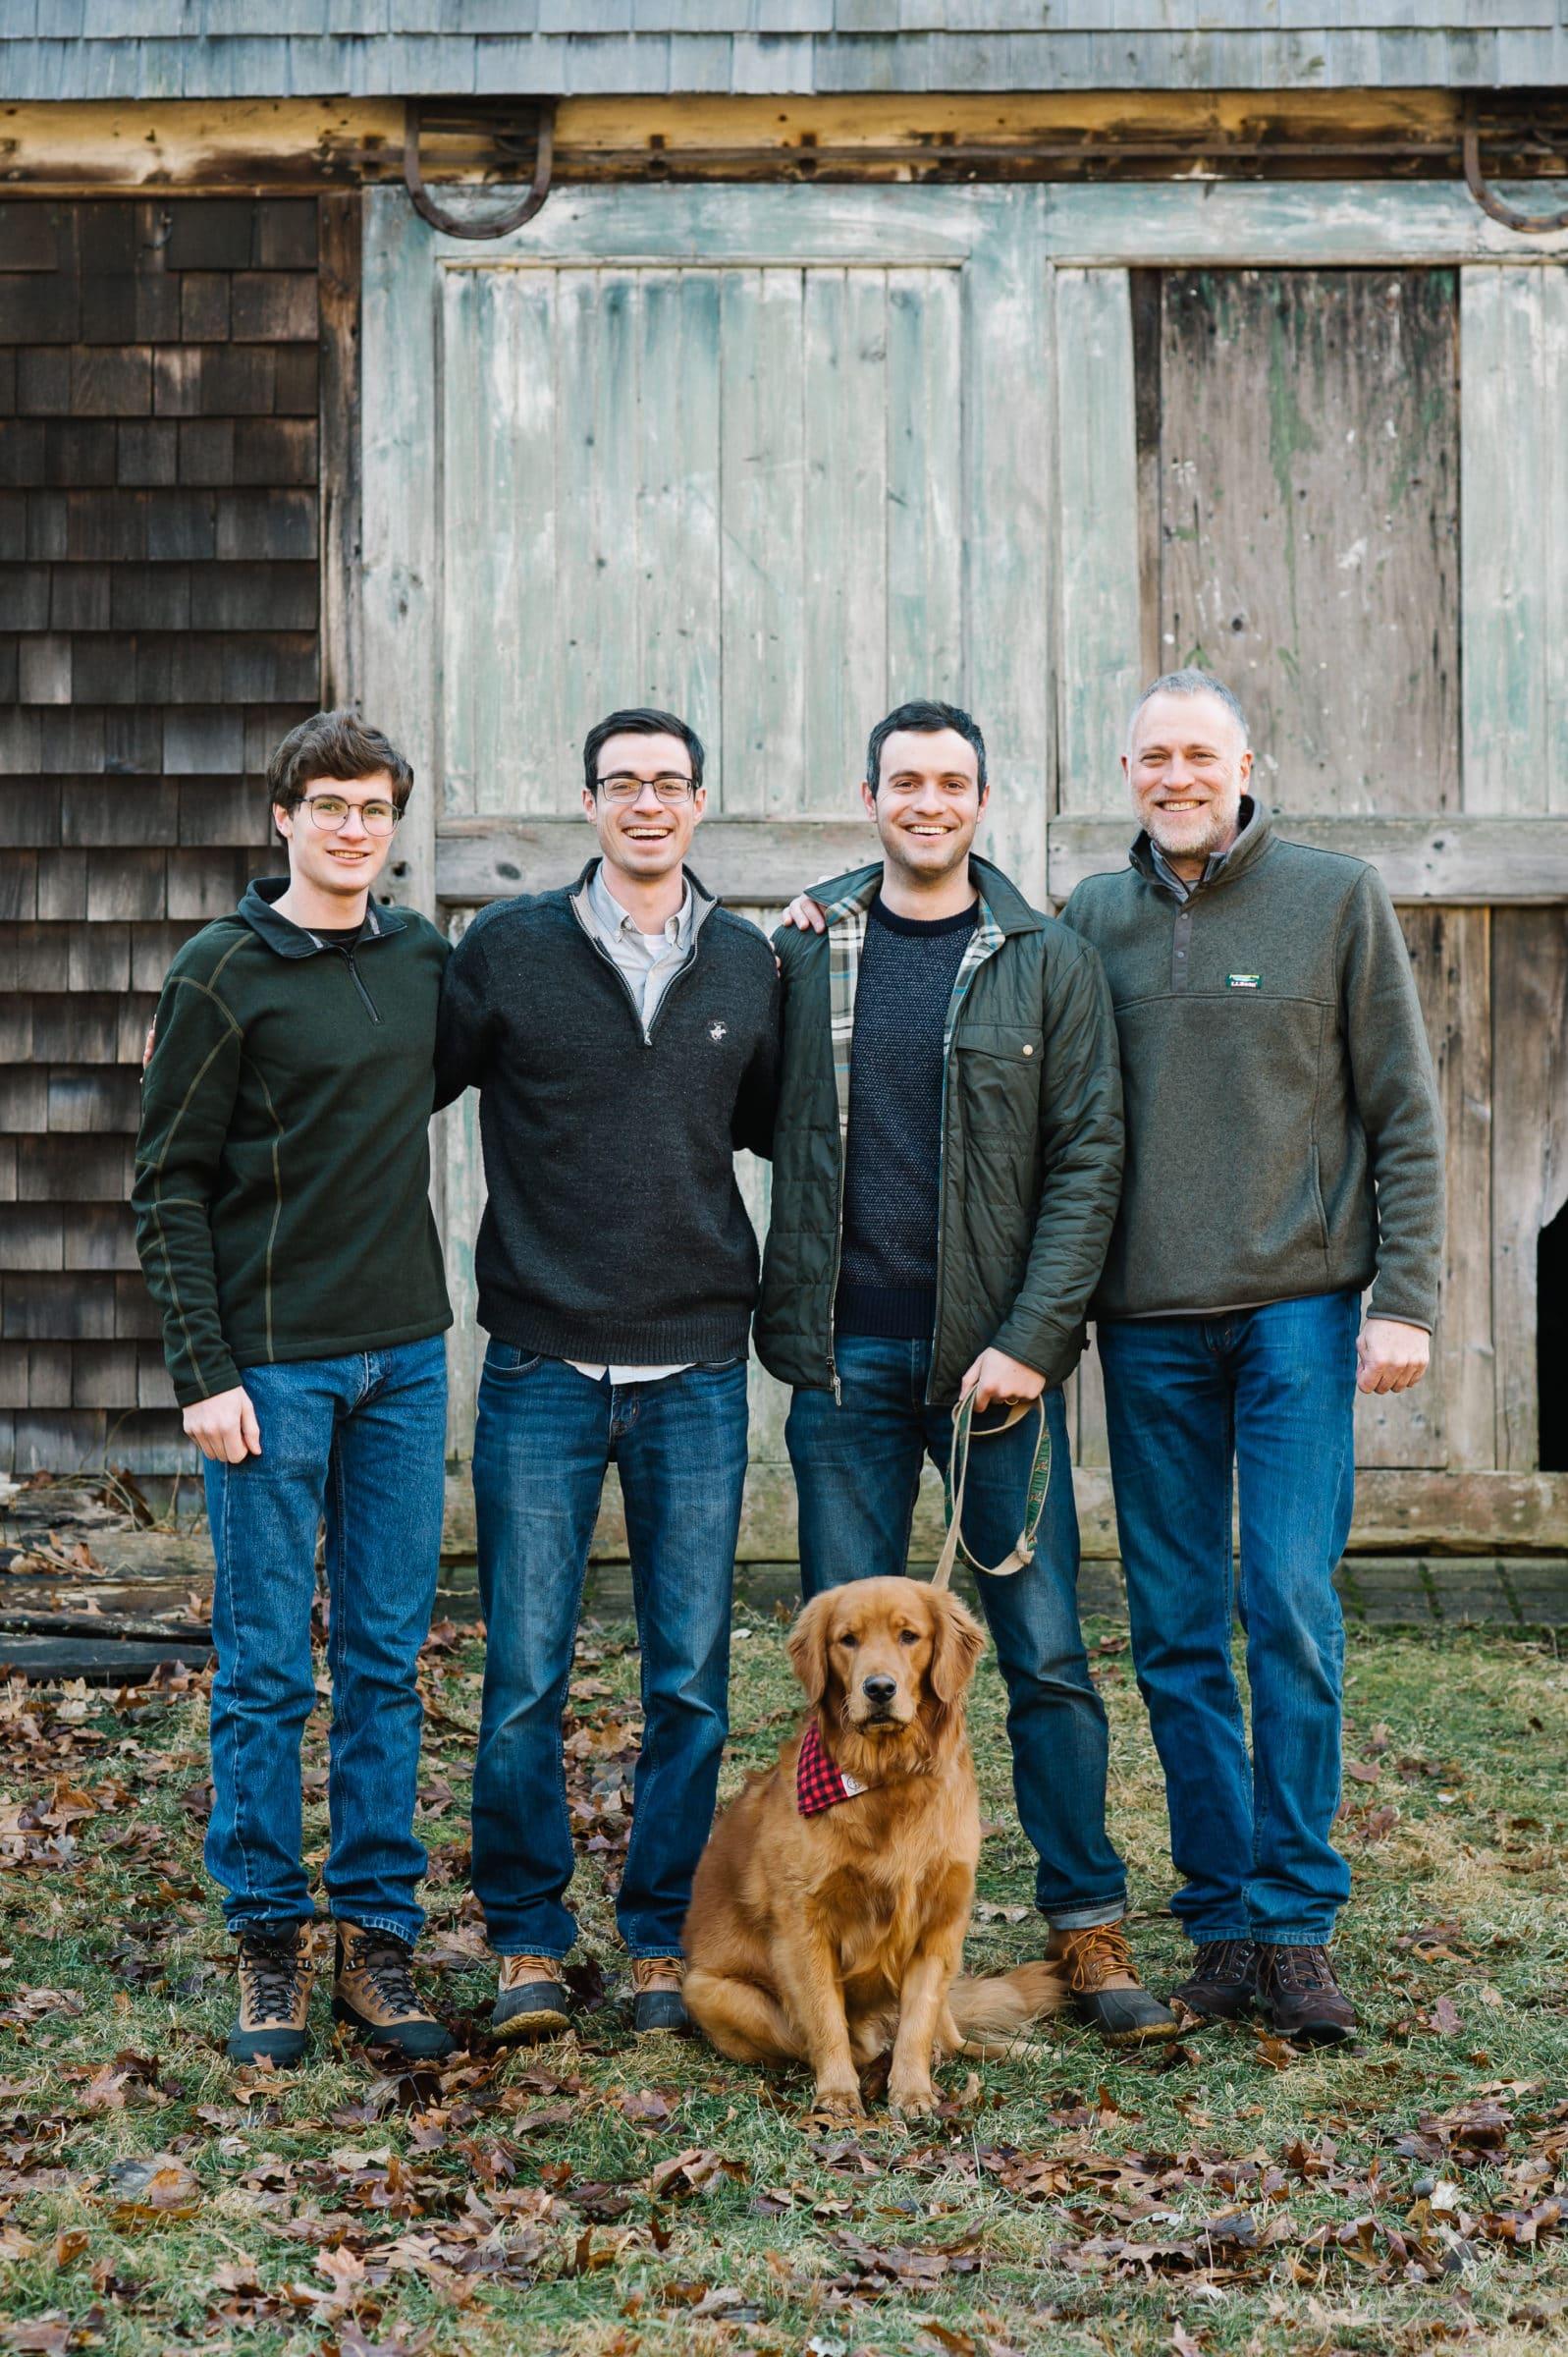 Minute Man National Park extended family session, Lexington